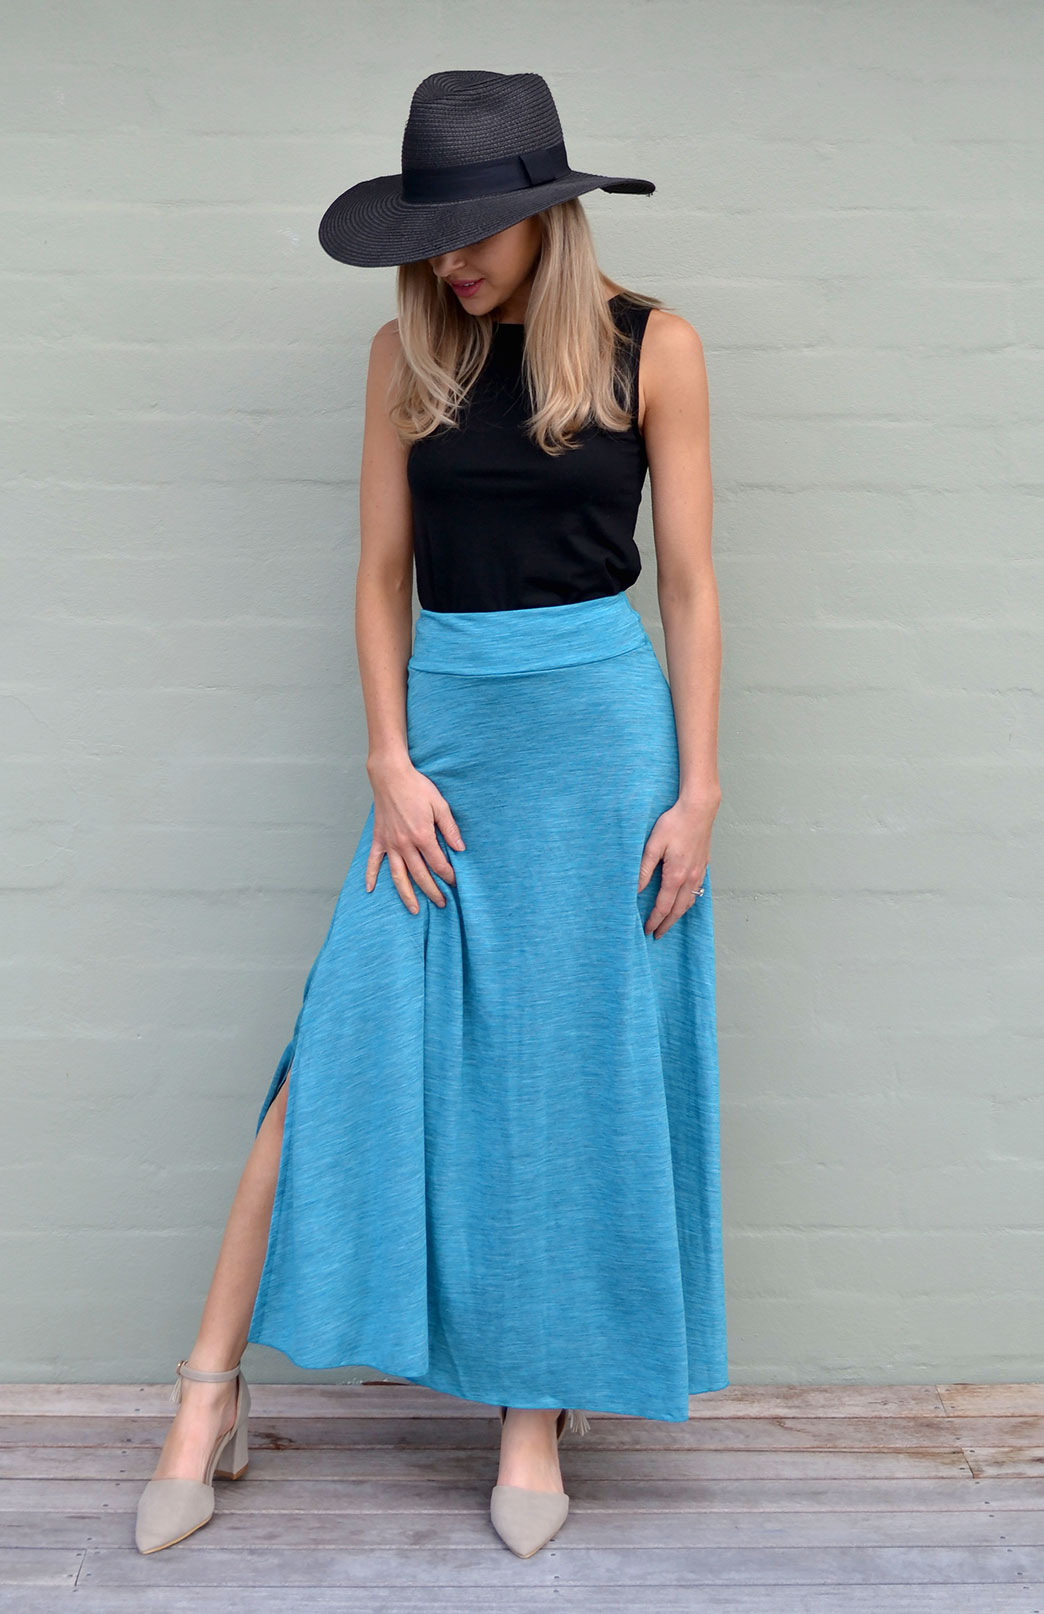 Marion Maxi Skirt - Women's Turquoise Pinstripe Merino Wool Blend Maxi Skirt - Smitten Merino Tasmania Australia